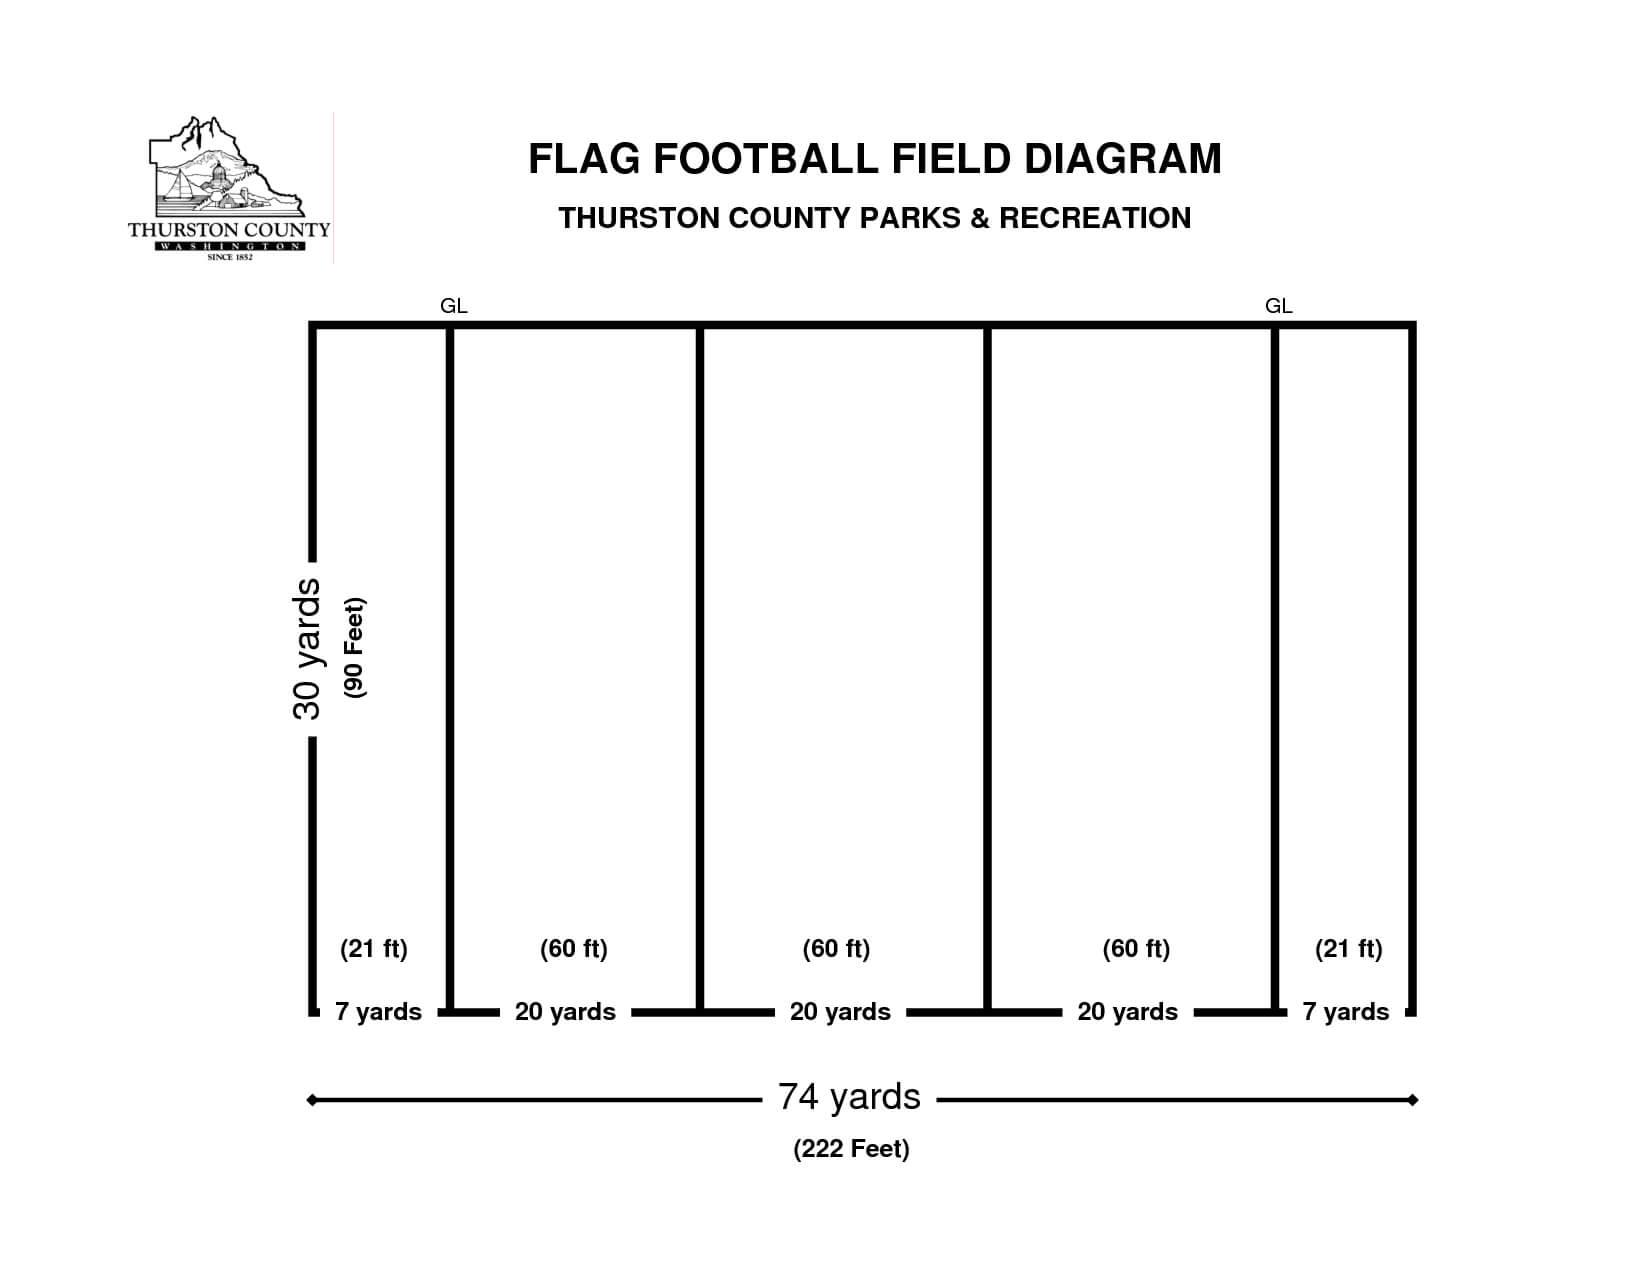 Best Photos Of Football Field Diagram Template - Blank throughout Blank Football Field Template